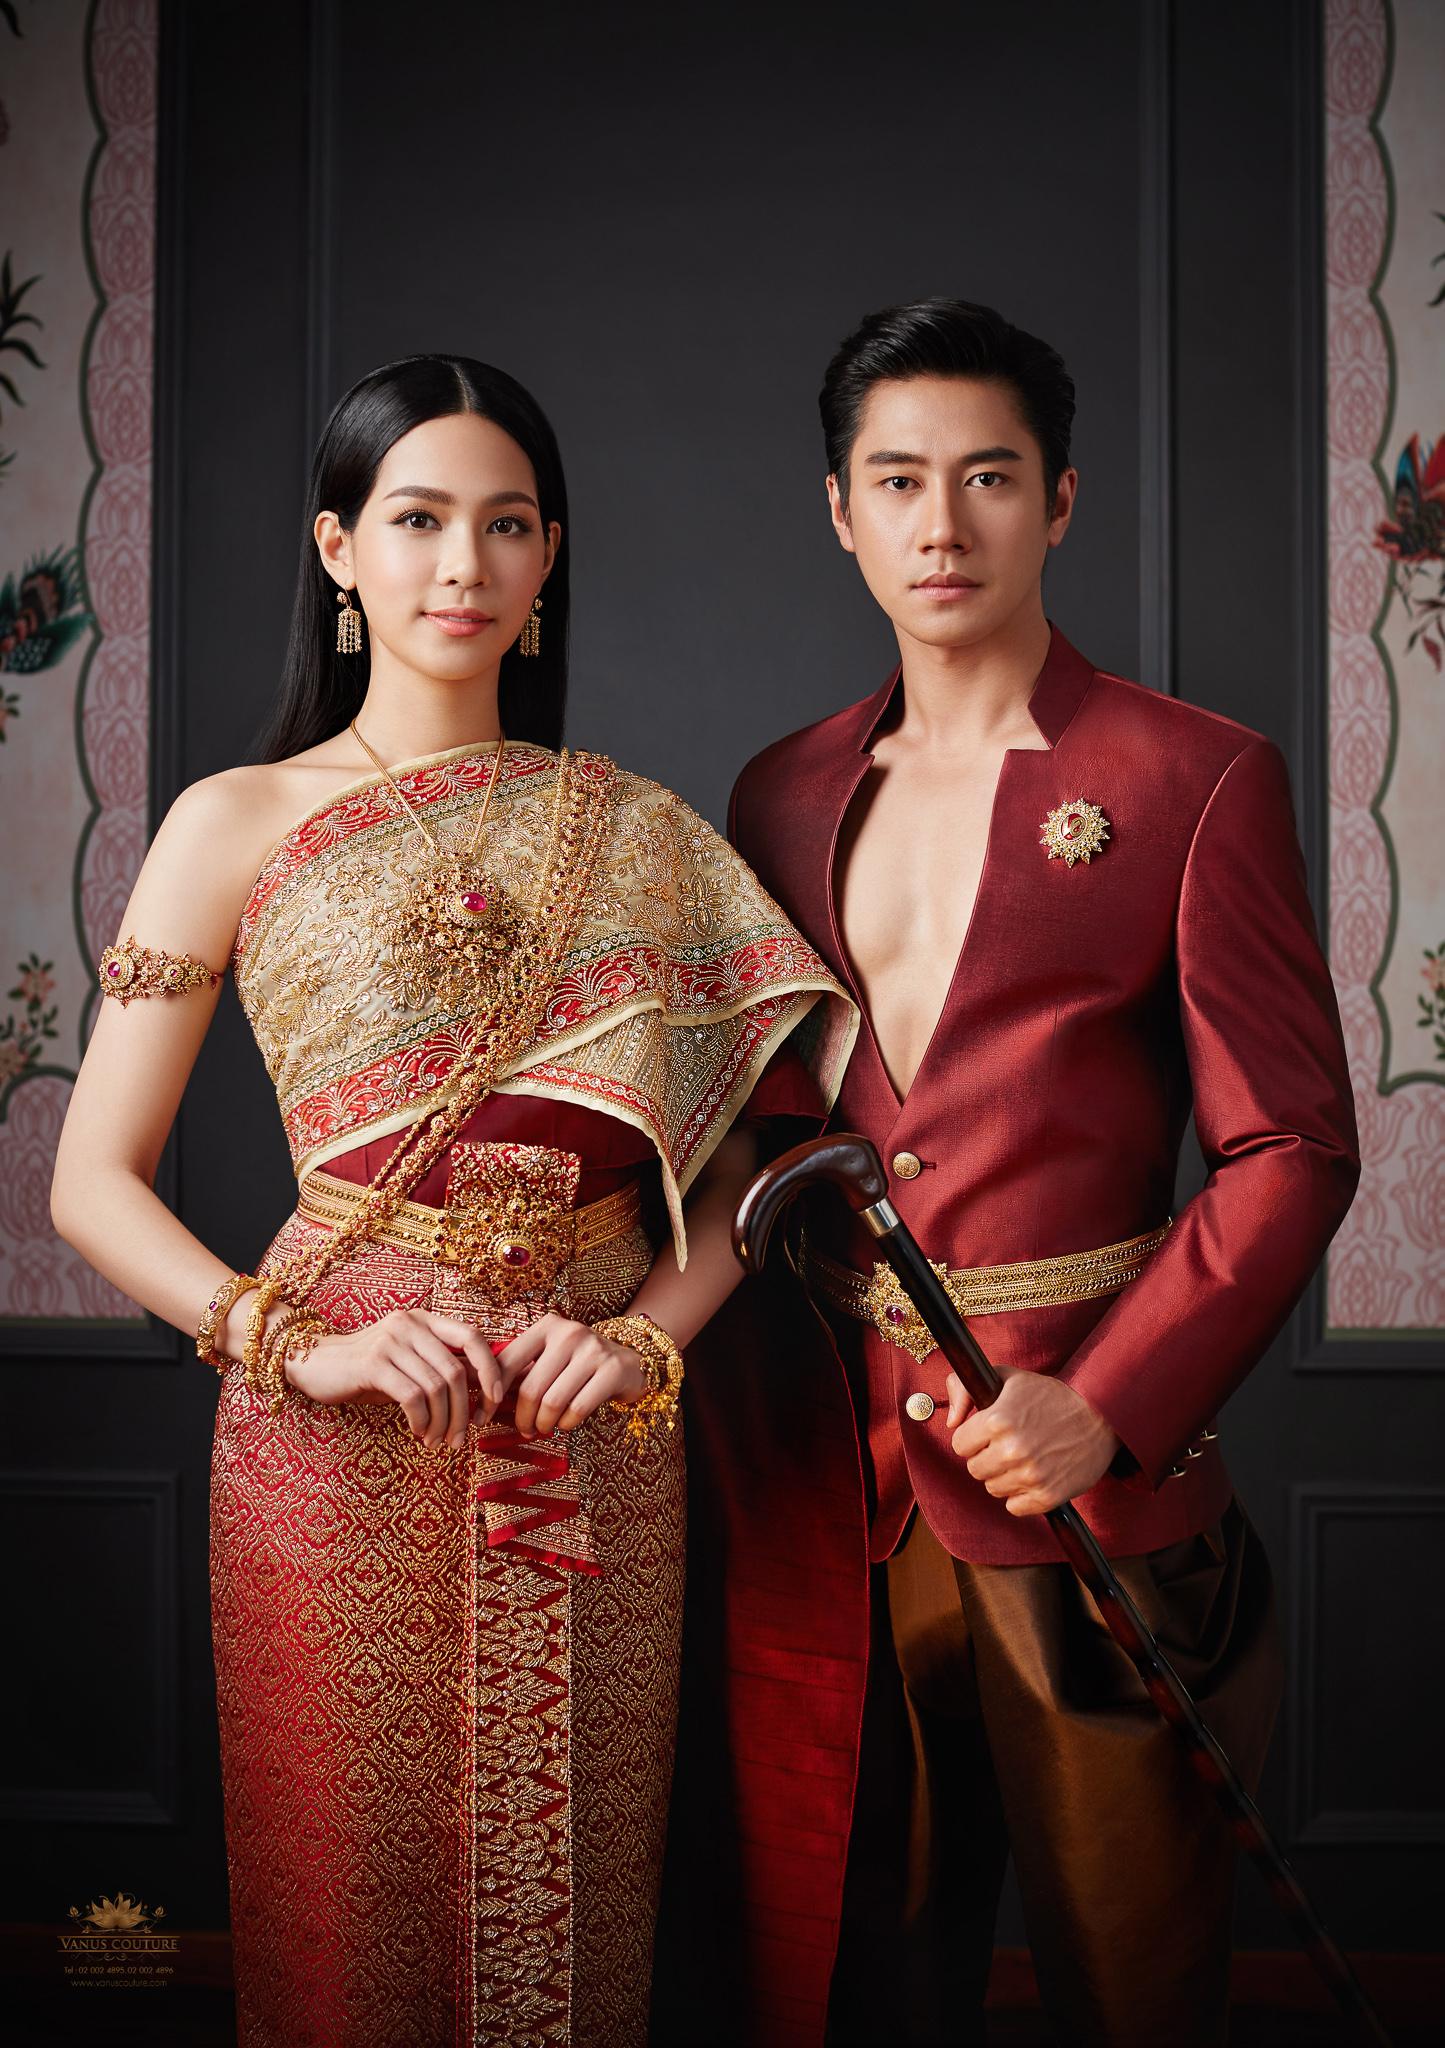 Thai traditional dress - Bint